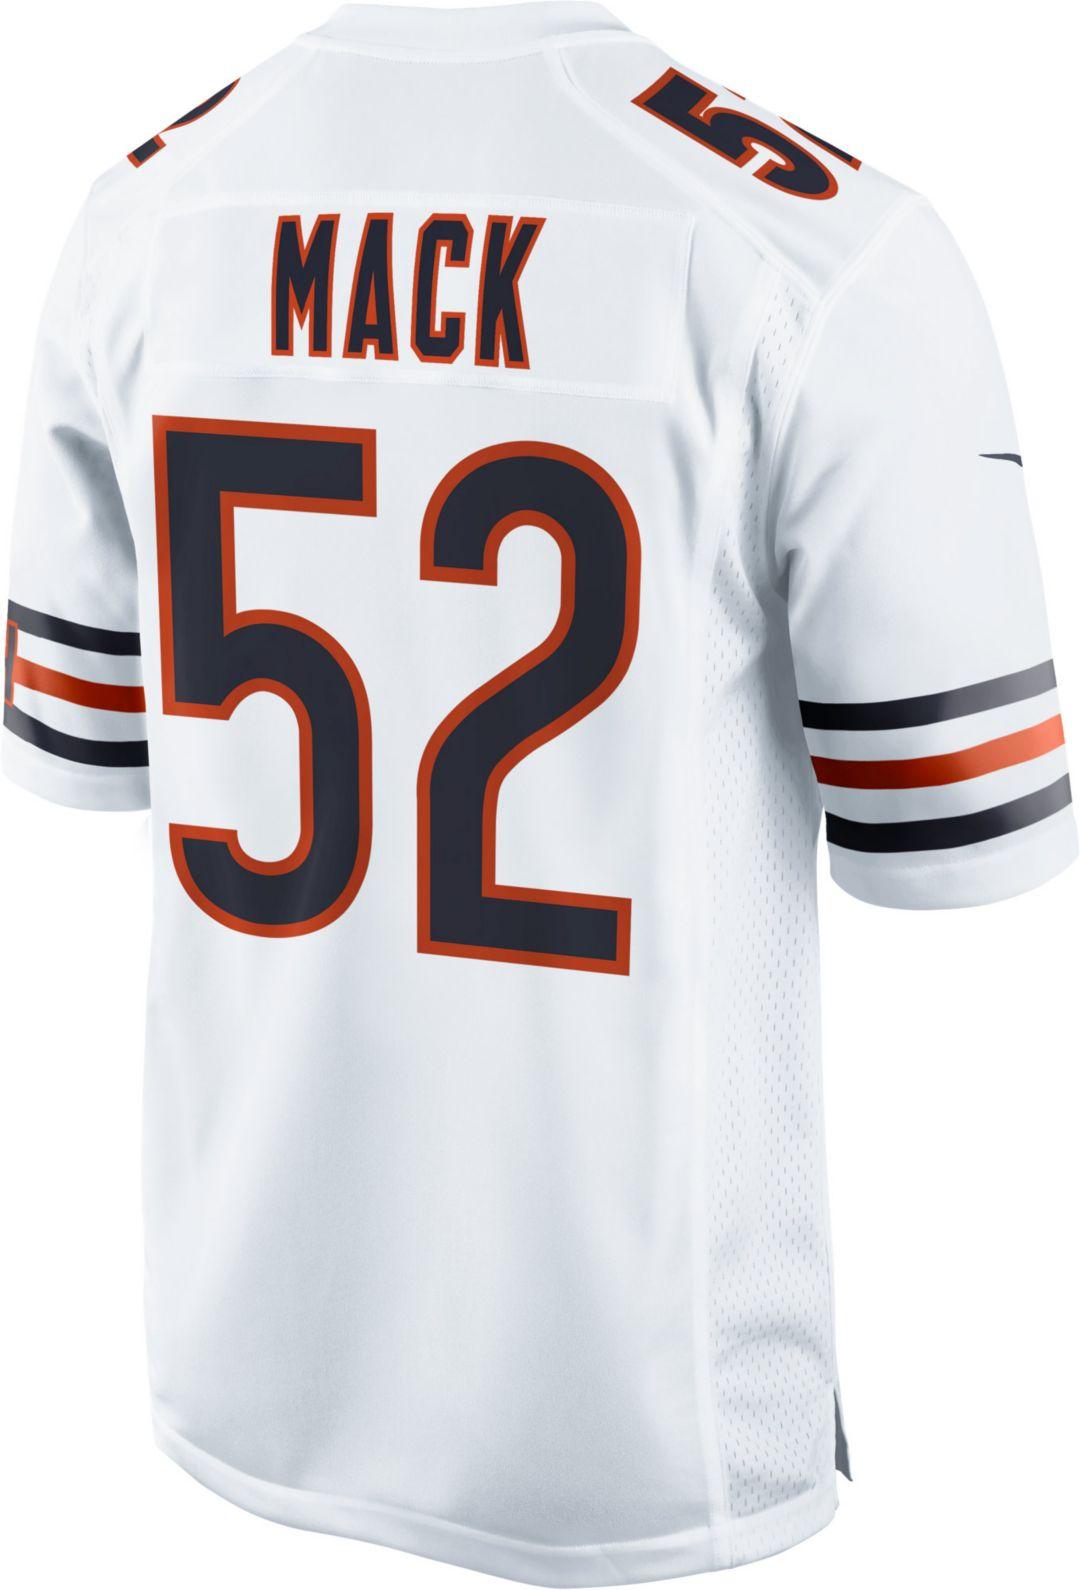 reputable site 9aed1 b3982 Nike Men's Away Game Jersey Chicago Bears Khalil Mack #52